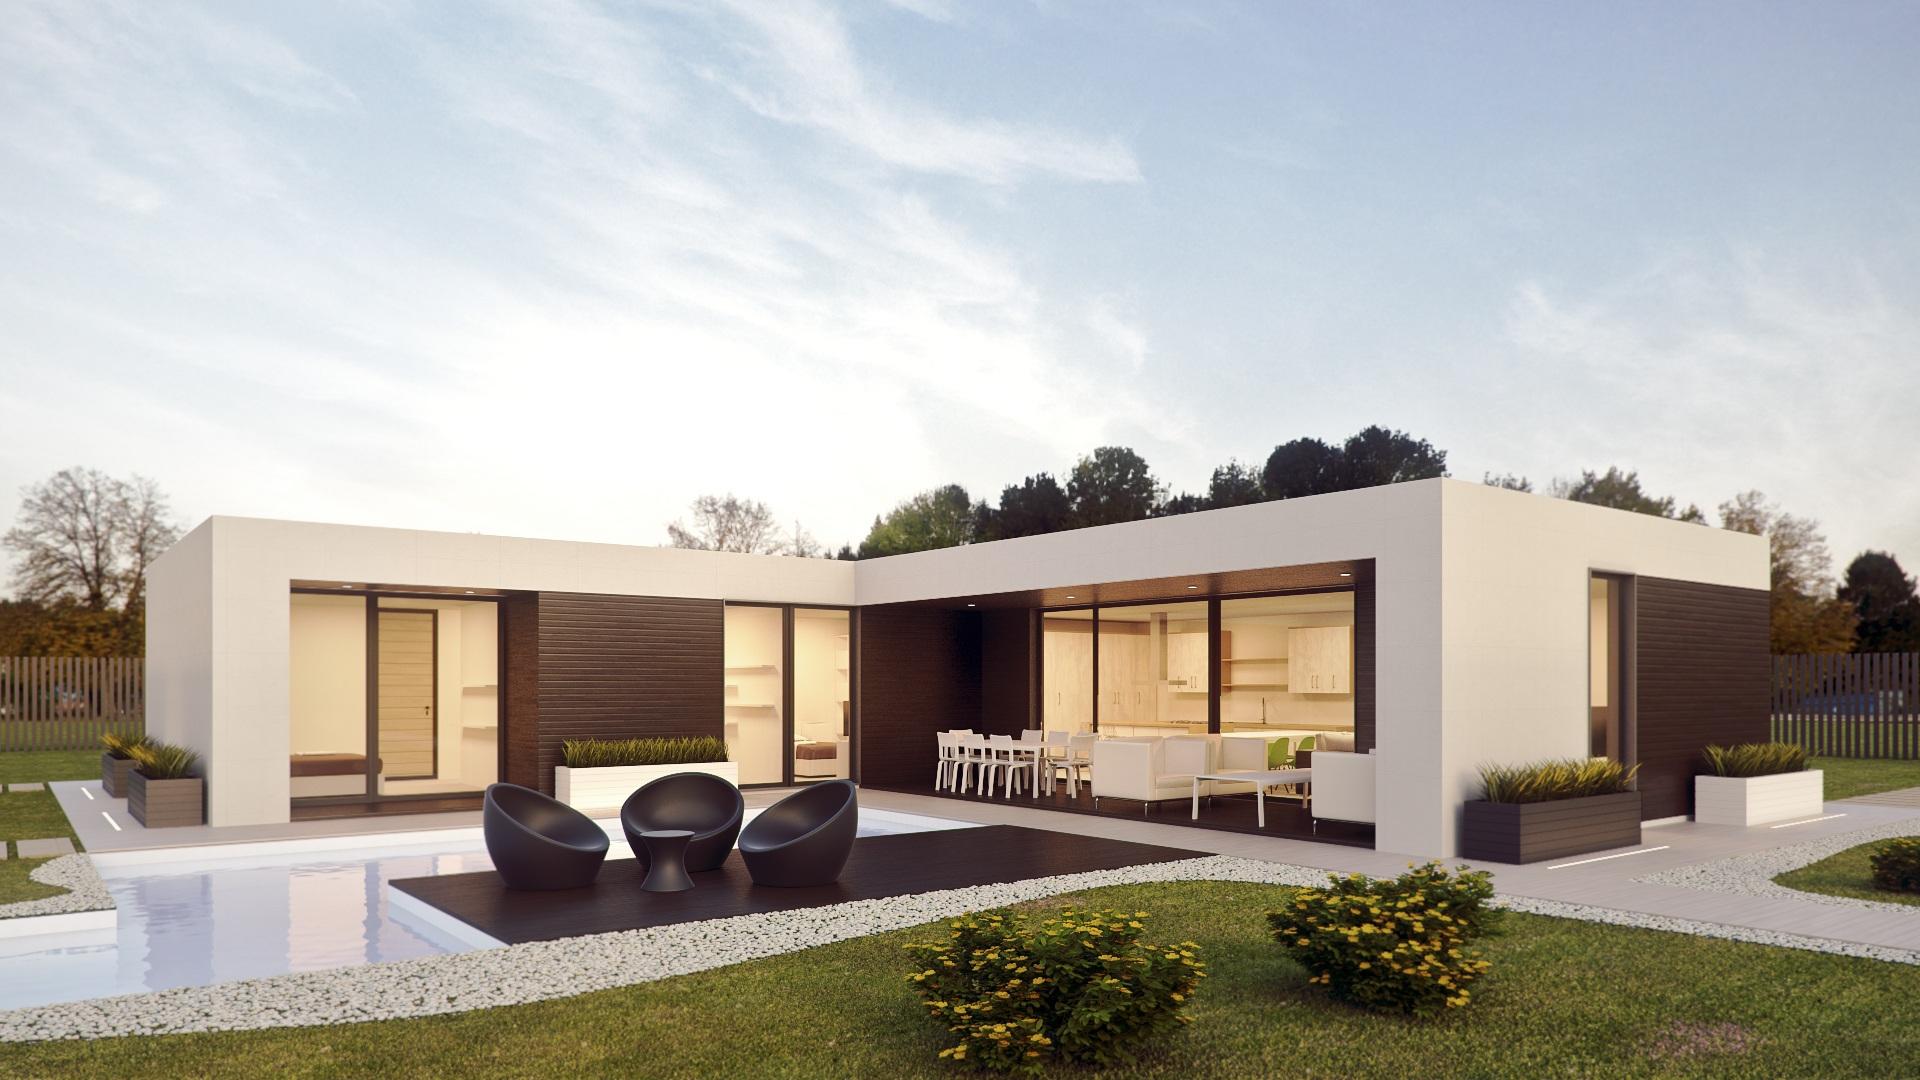 architecture-villa-mansion-house-building-home-599830-pxhere.com.jpg